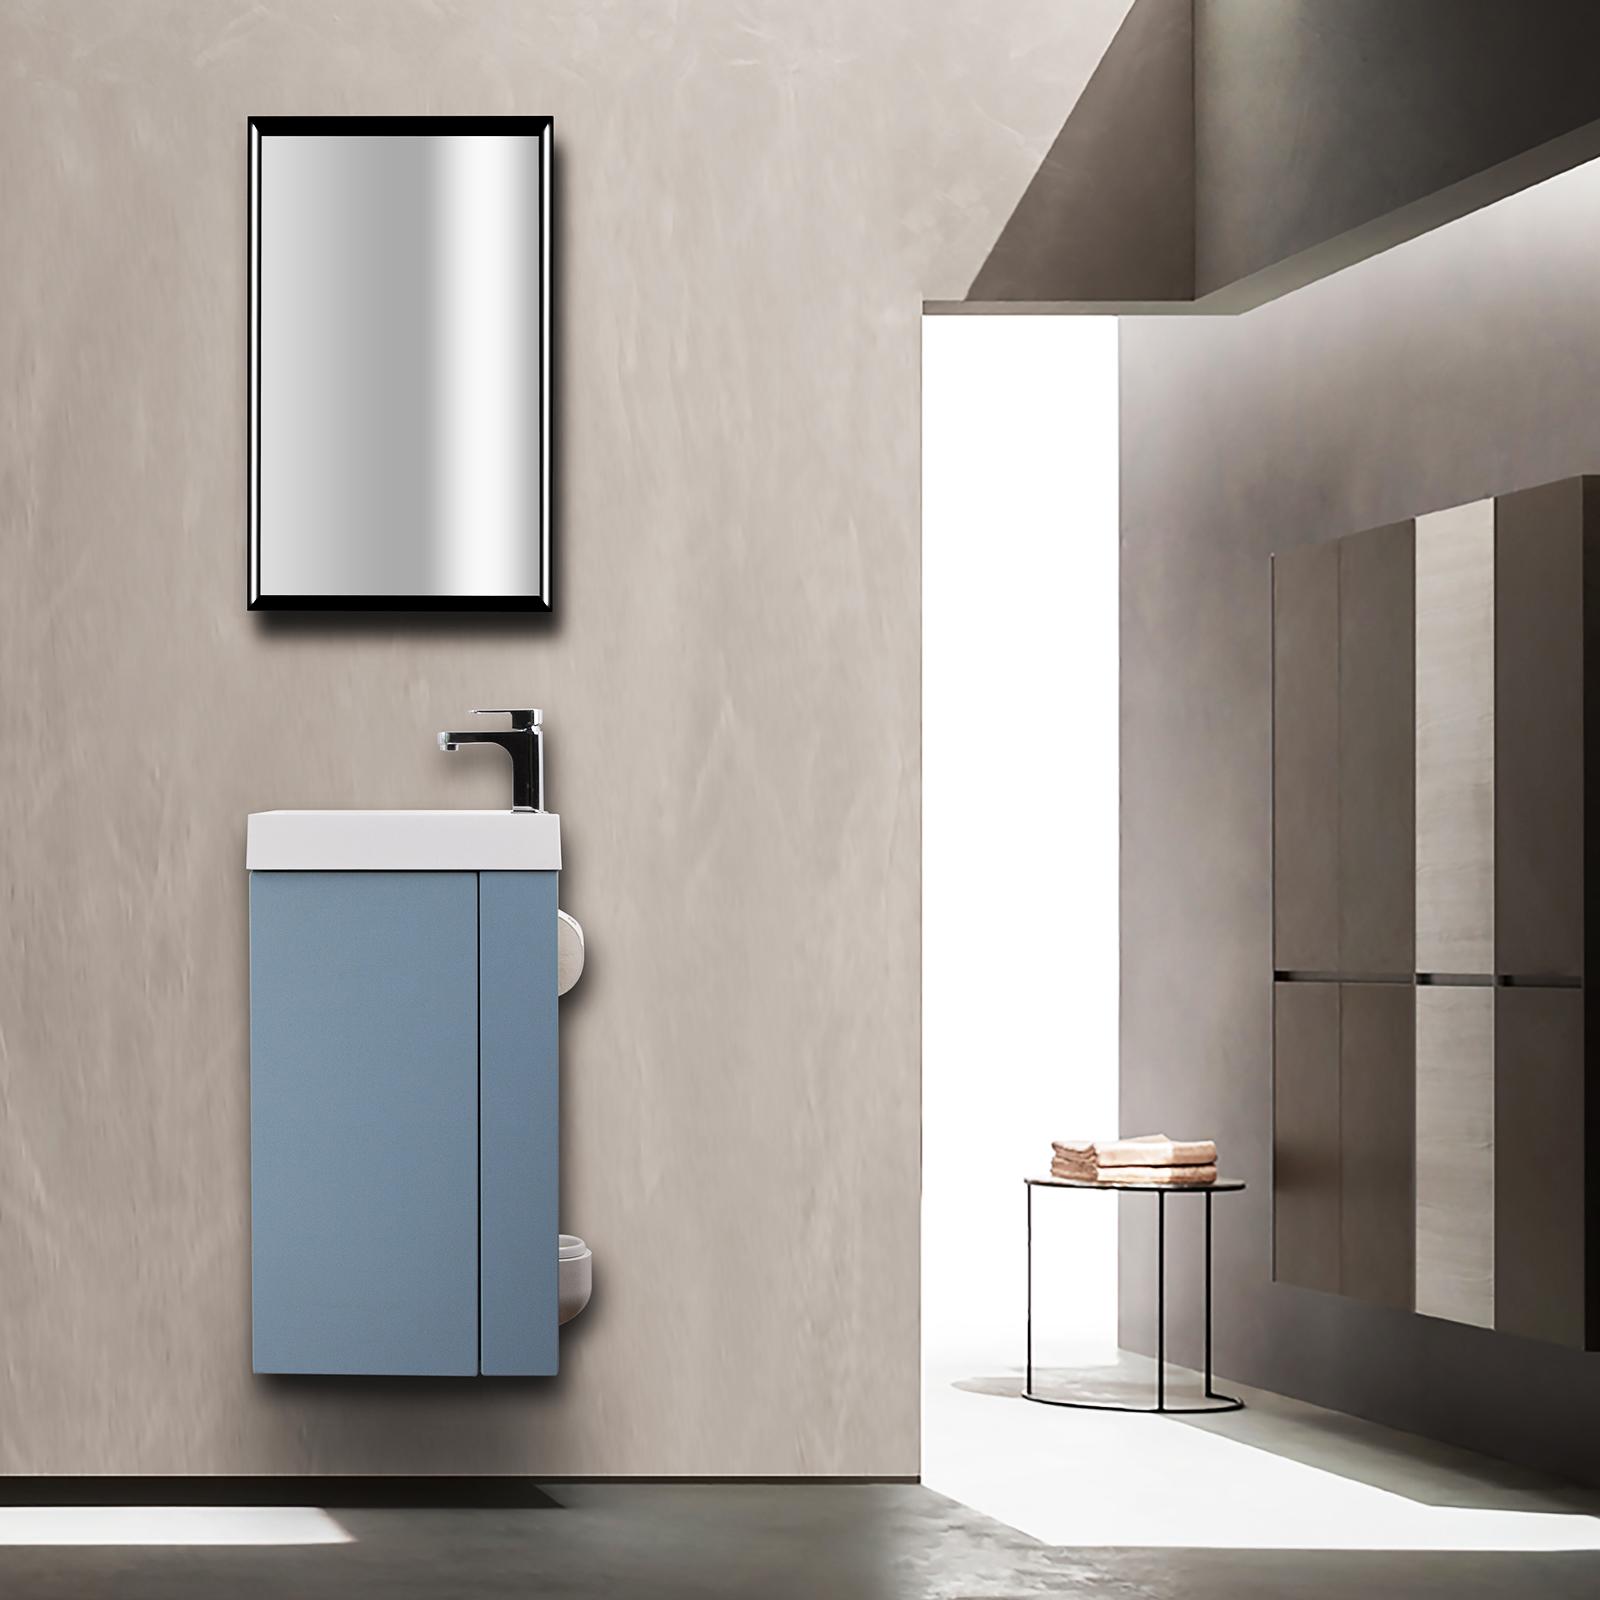 Badmöbel-Set Compact 400 für Gäste-WC - Richtung wählbar - Taubenblau matt